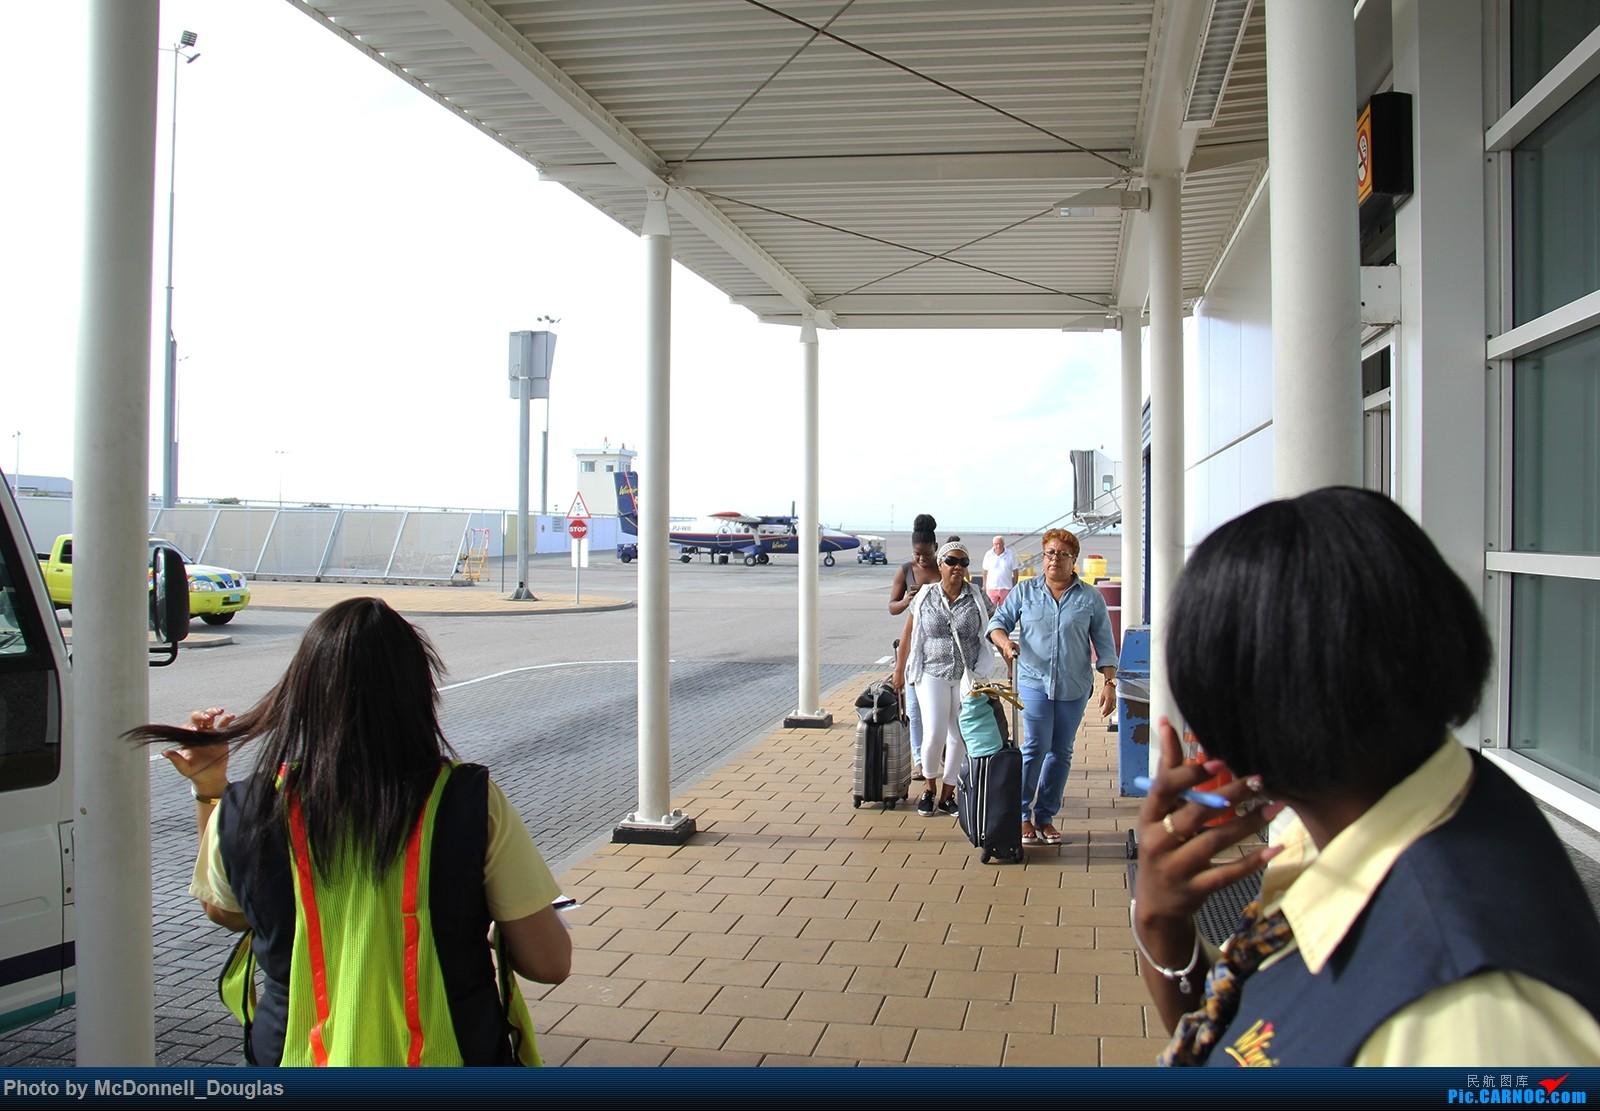 Re:[原创]【上海飞友会】图会很多,也有很多驾驶舱,杂七杂八的美帝,梦寐以求的圣马丁,这更绝不弃贴【驾驶舱已出现】【已更新至圣马丁部分】    荷属安的列斯群岛朱利安娜公主机场